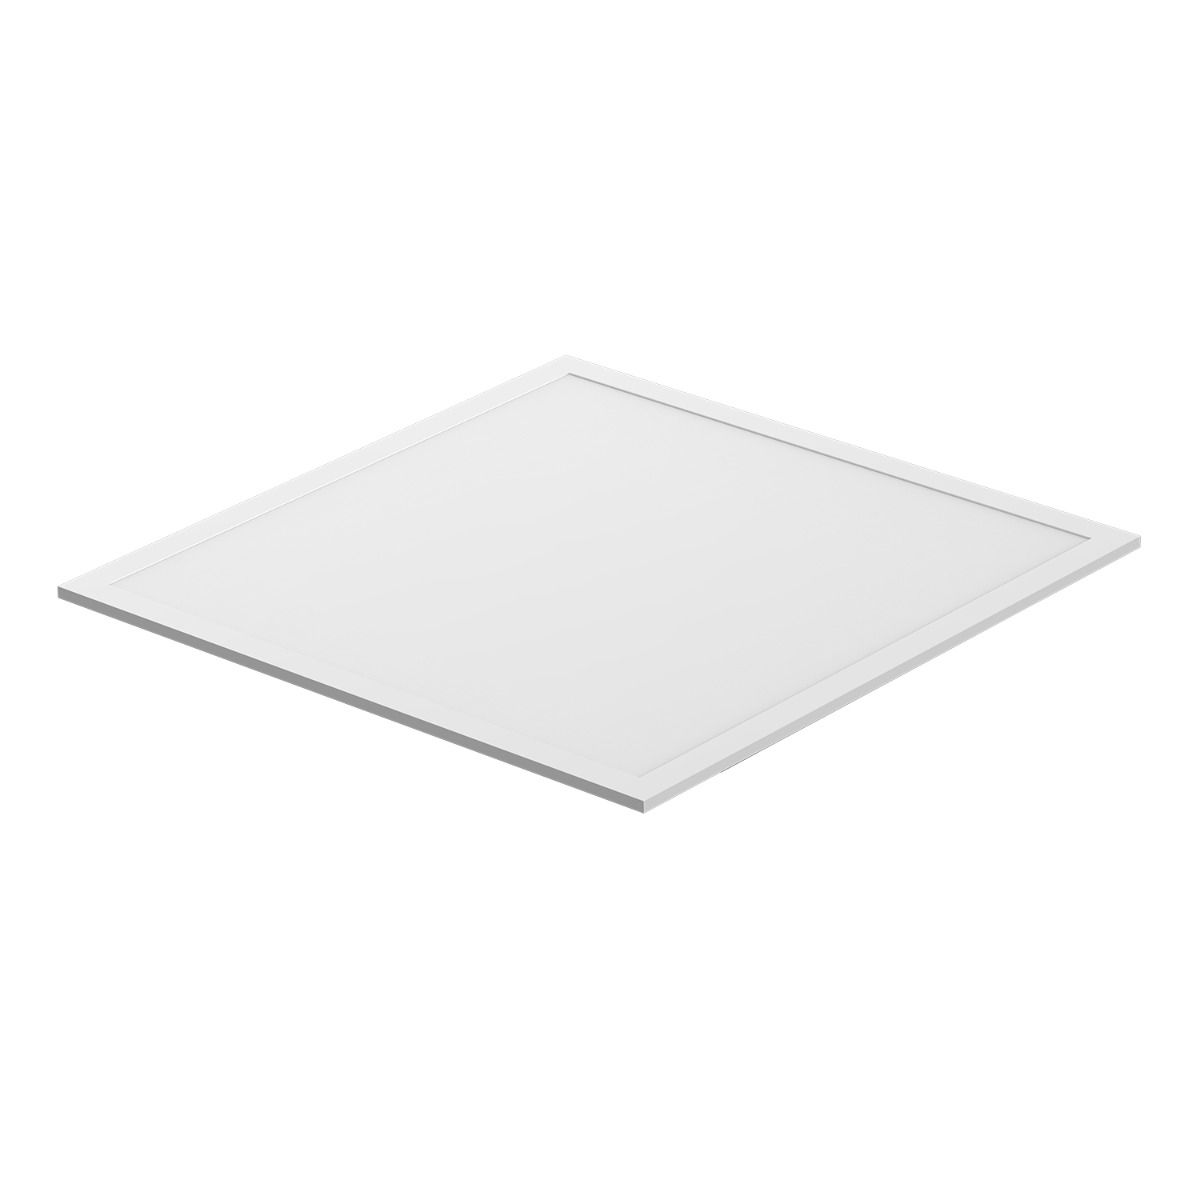 Noxion Delta Pro LED Panel UGR<19 V2.0 30W 4110lm 6500K 600x600 + GST18 Male + Xitanium | Daylight